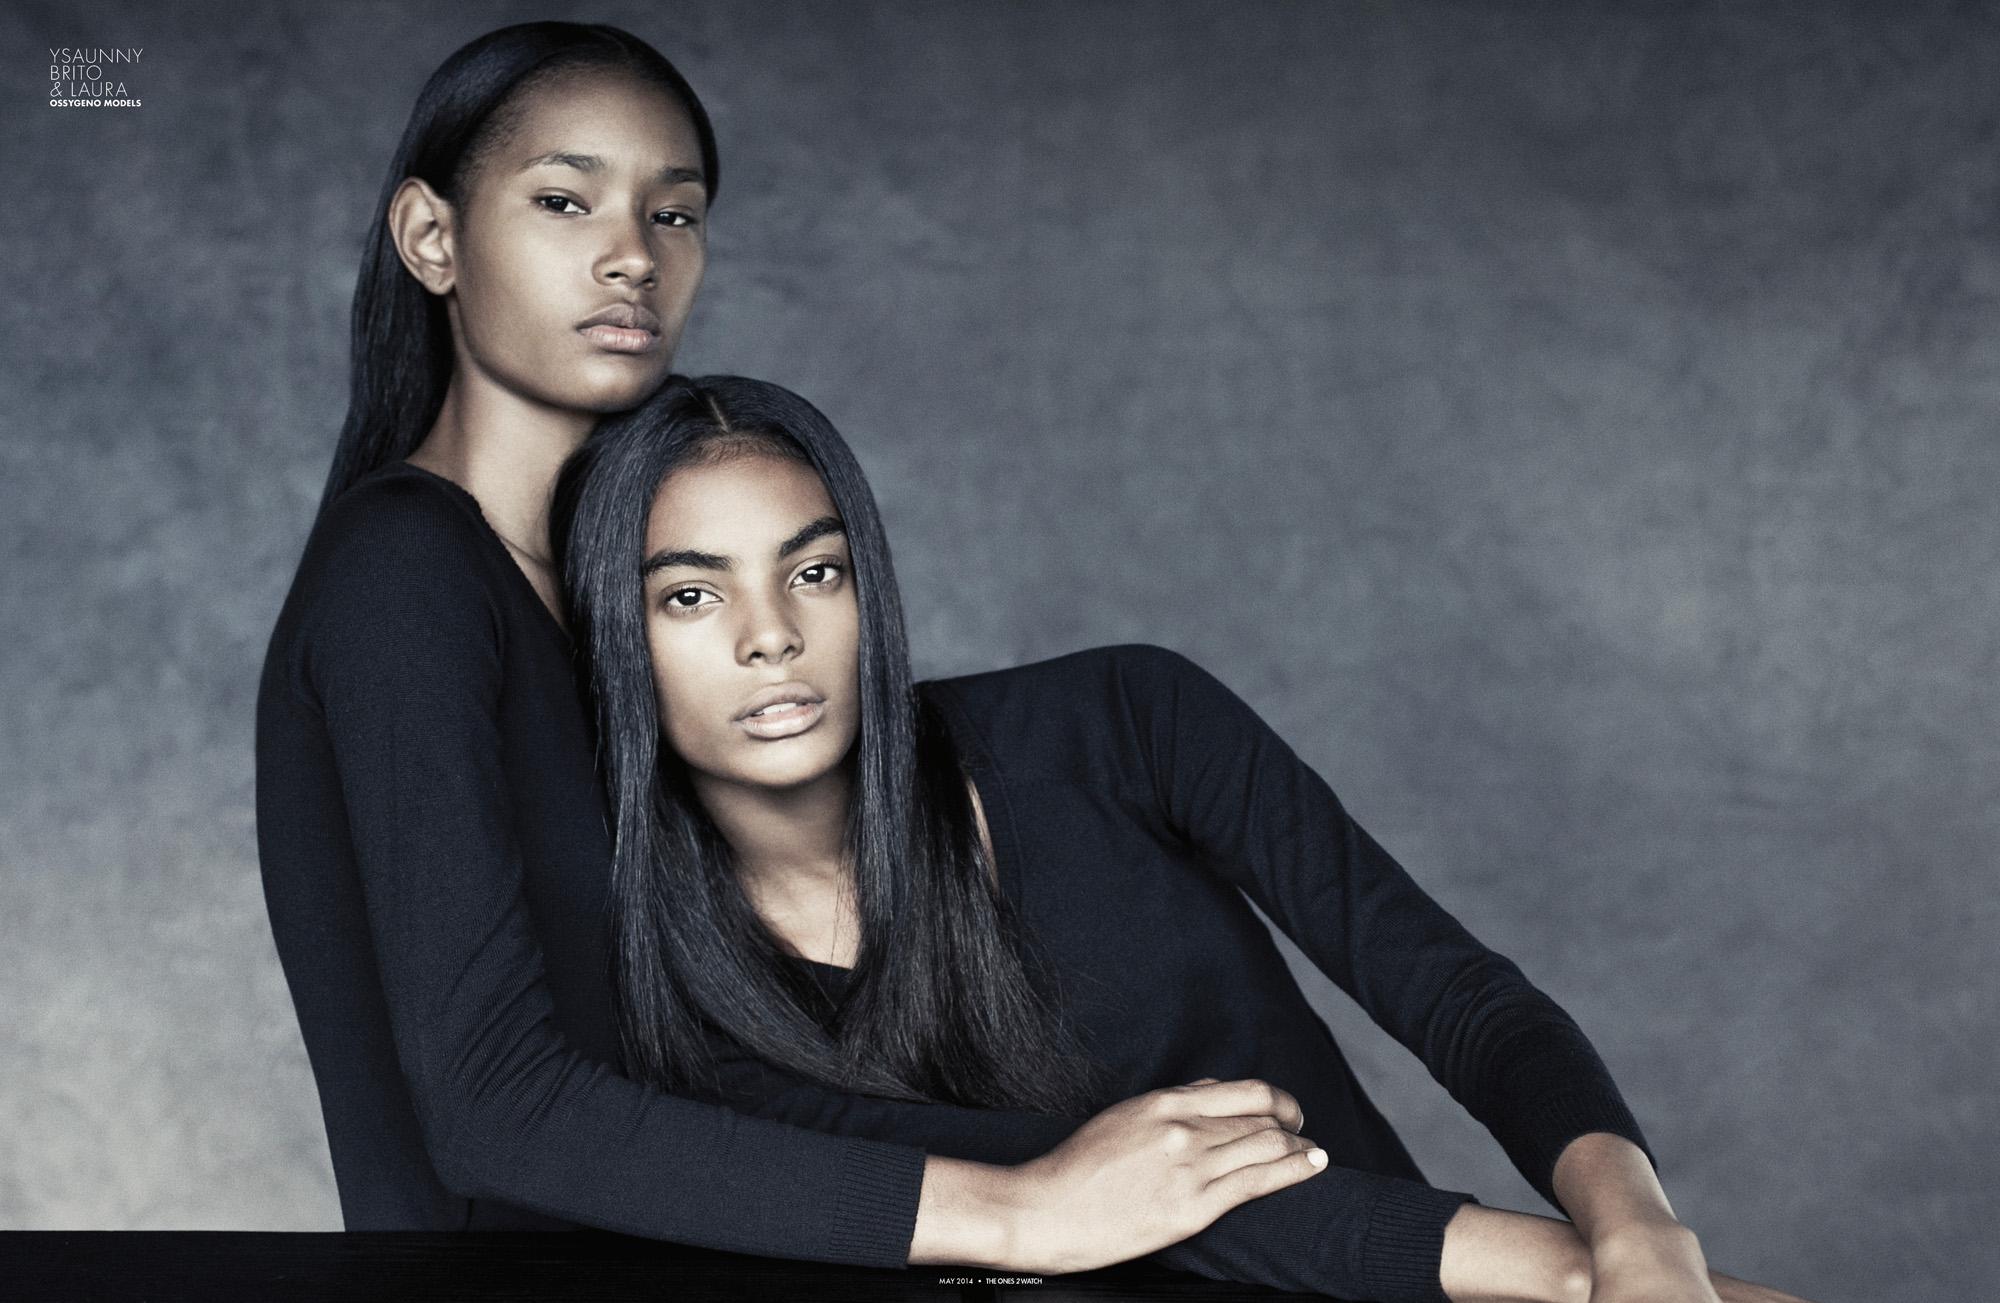 YSAUNNY BRITO  & LAURA @ OSSYGENO MODELS